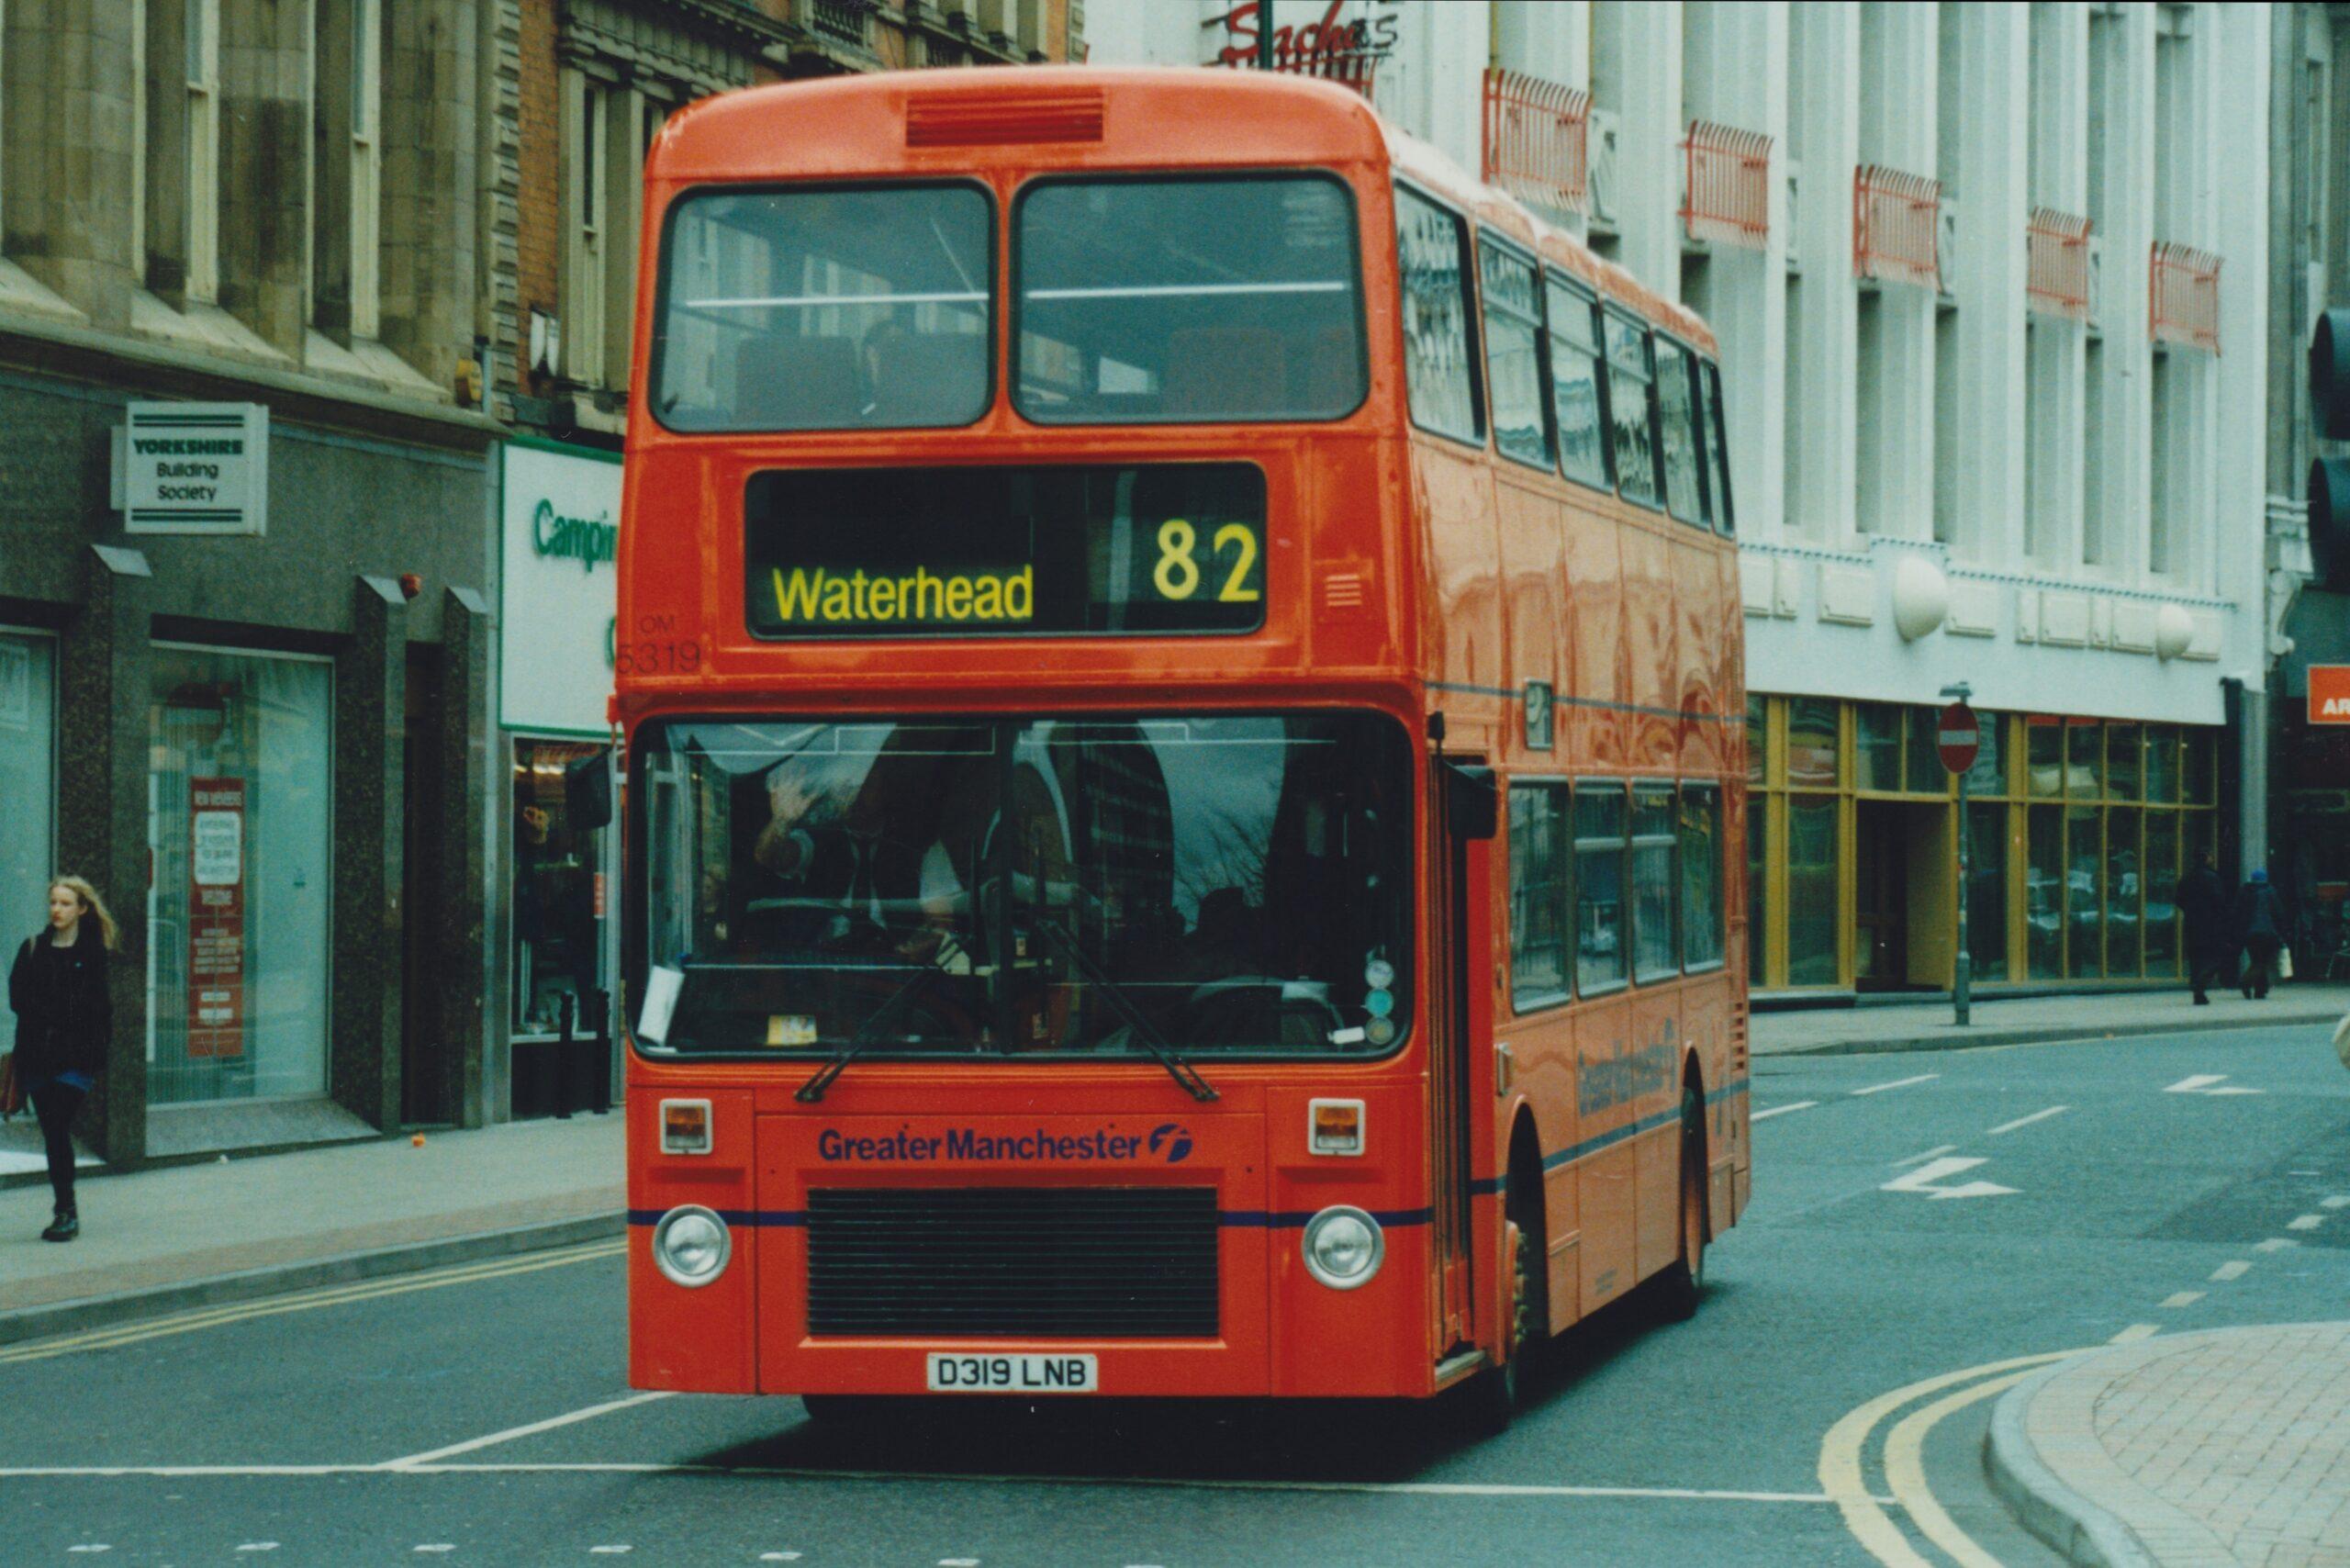 #AYearOfBuses 82: Manchester – Waterhead